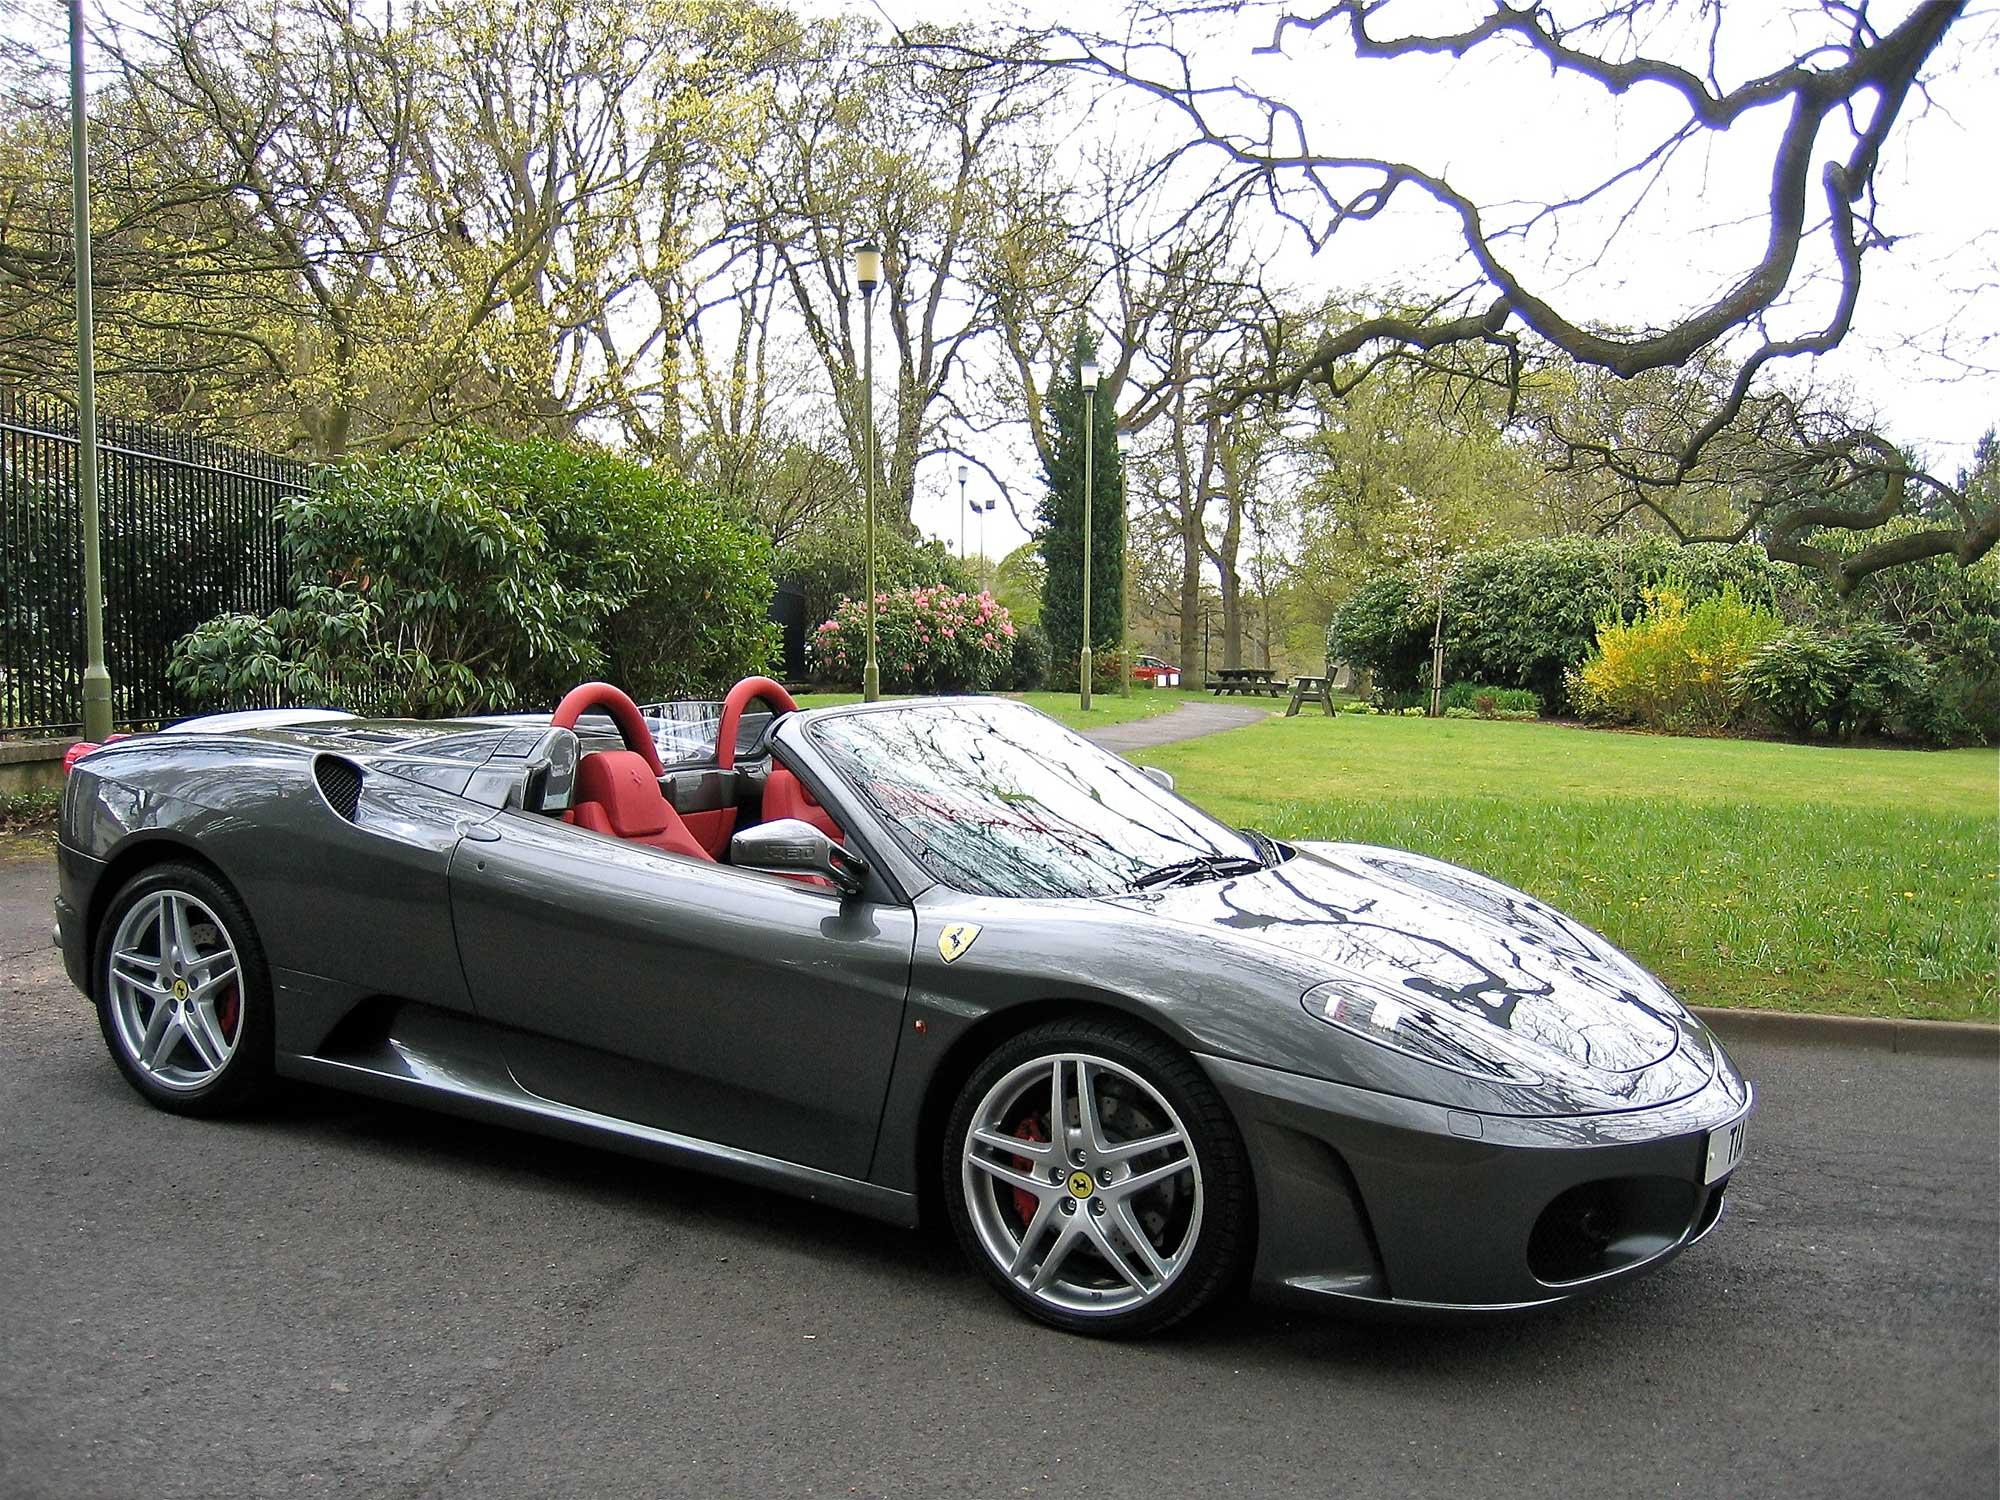 2007 Ferrari F430 4.3 Spider Convertible